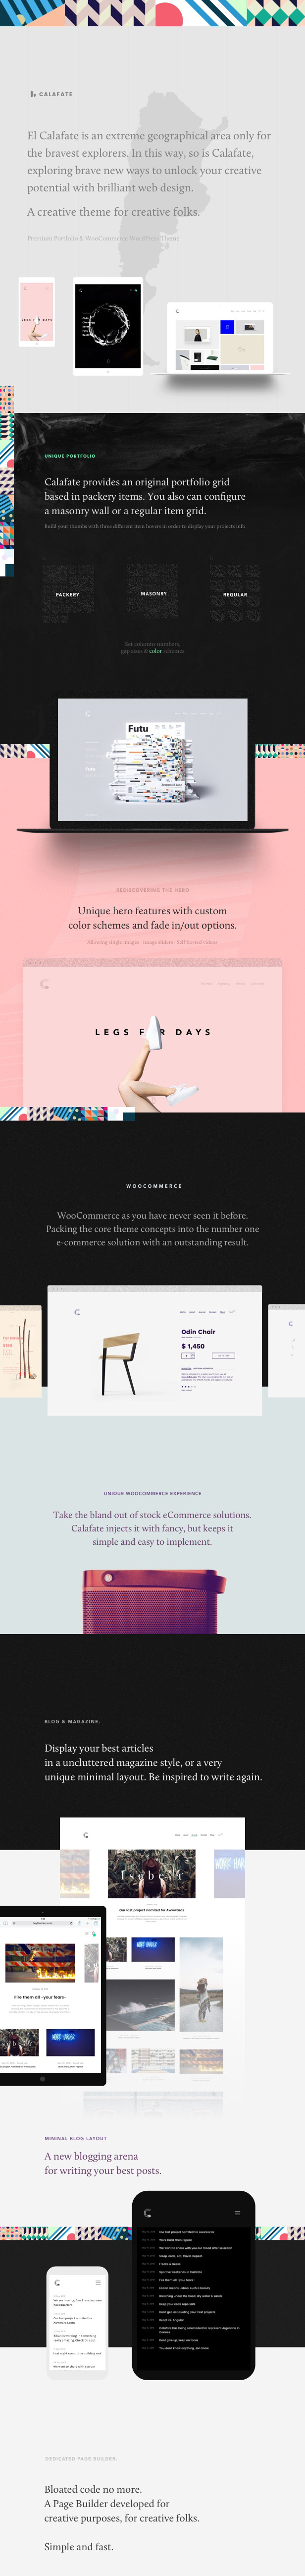 themeforest intro 2 - Calafate - Portfolio & WooCommerce Creative WordPress Theme